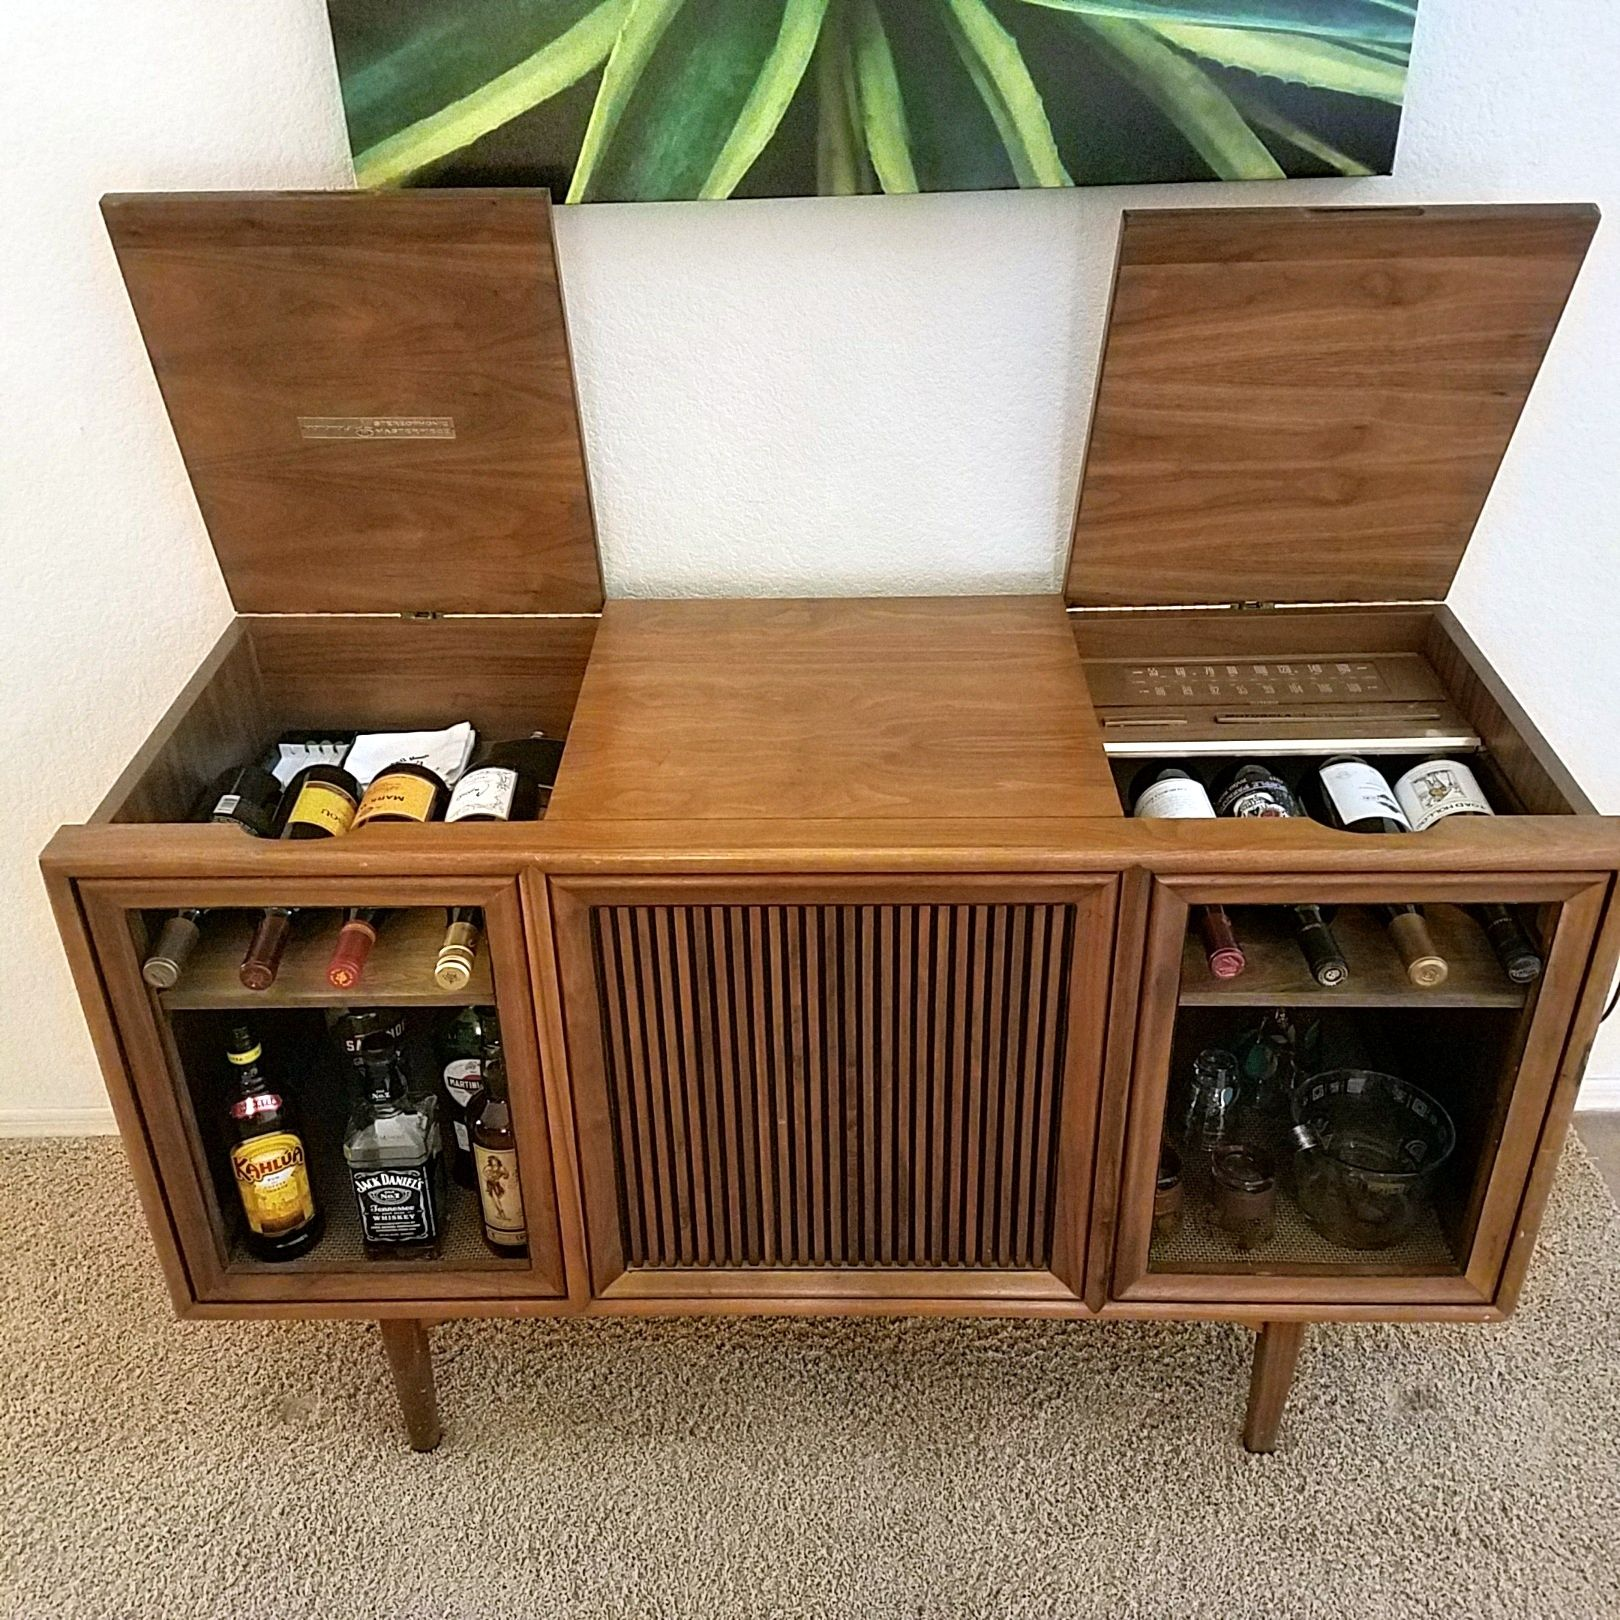 modern vinterior antique vintage bar drinks listings retro teak danish century nathan cabinet mid